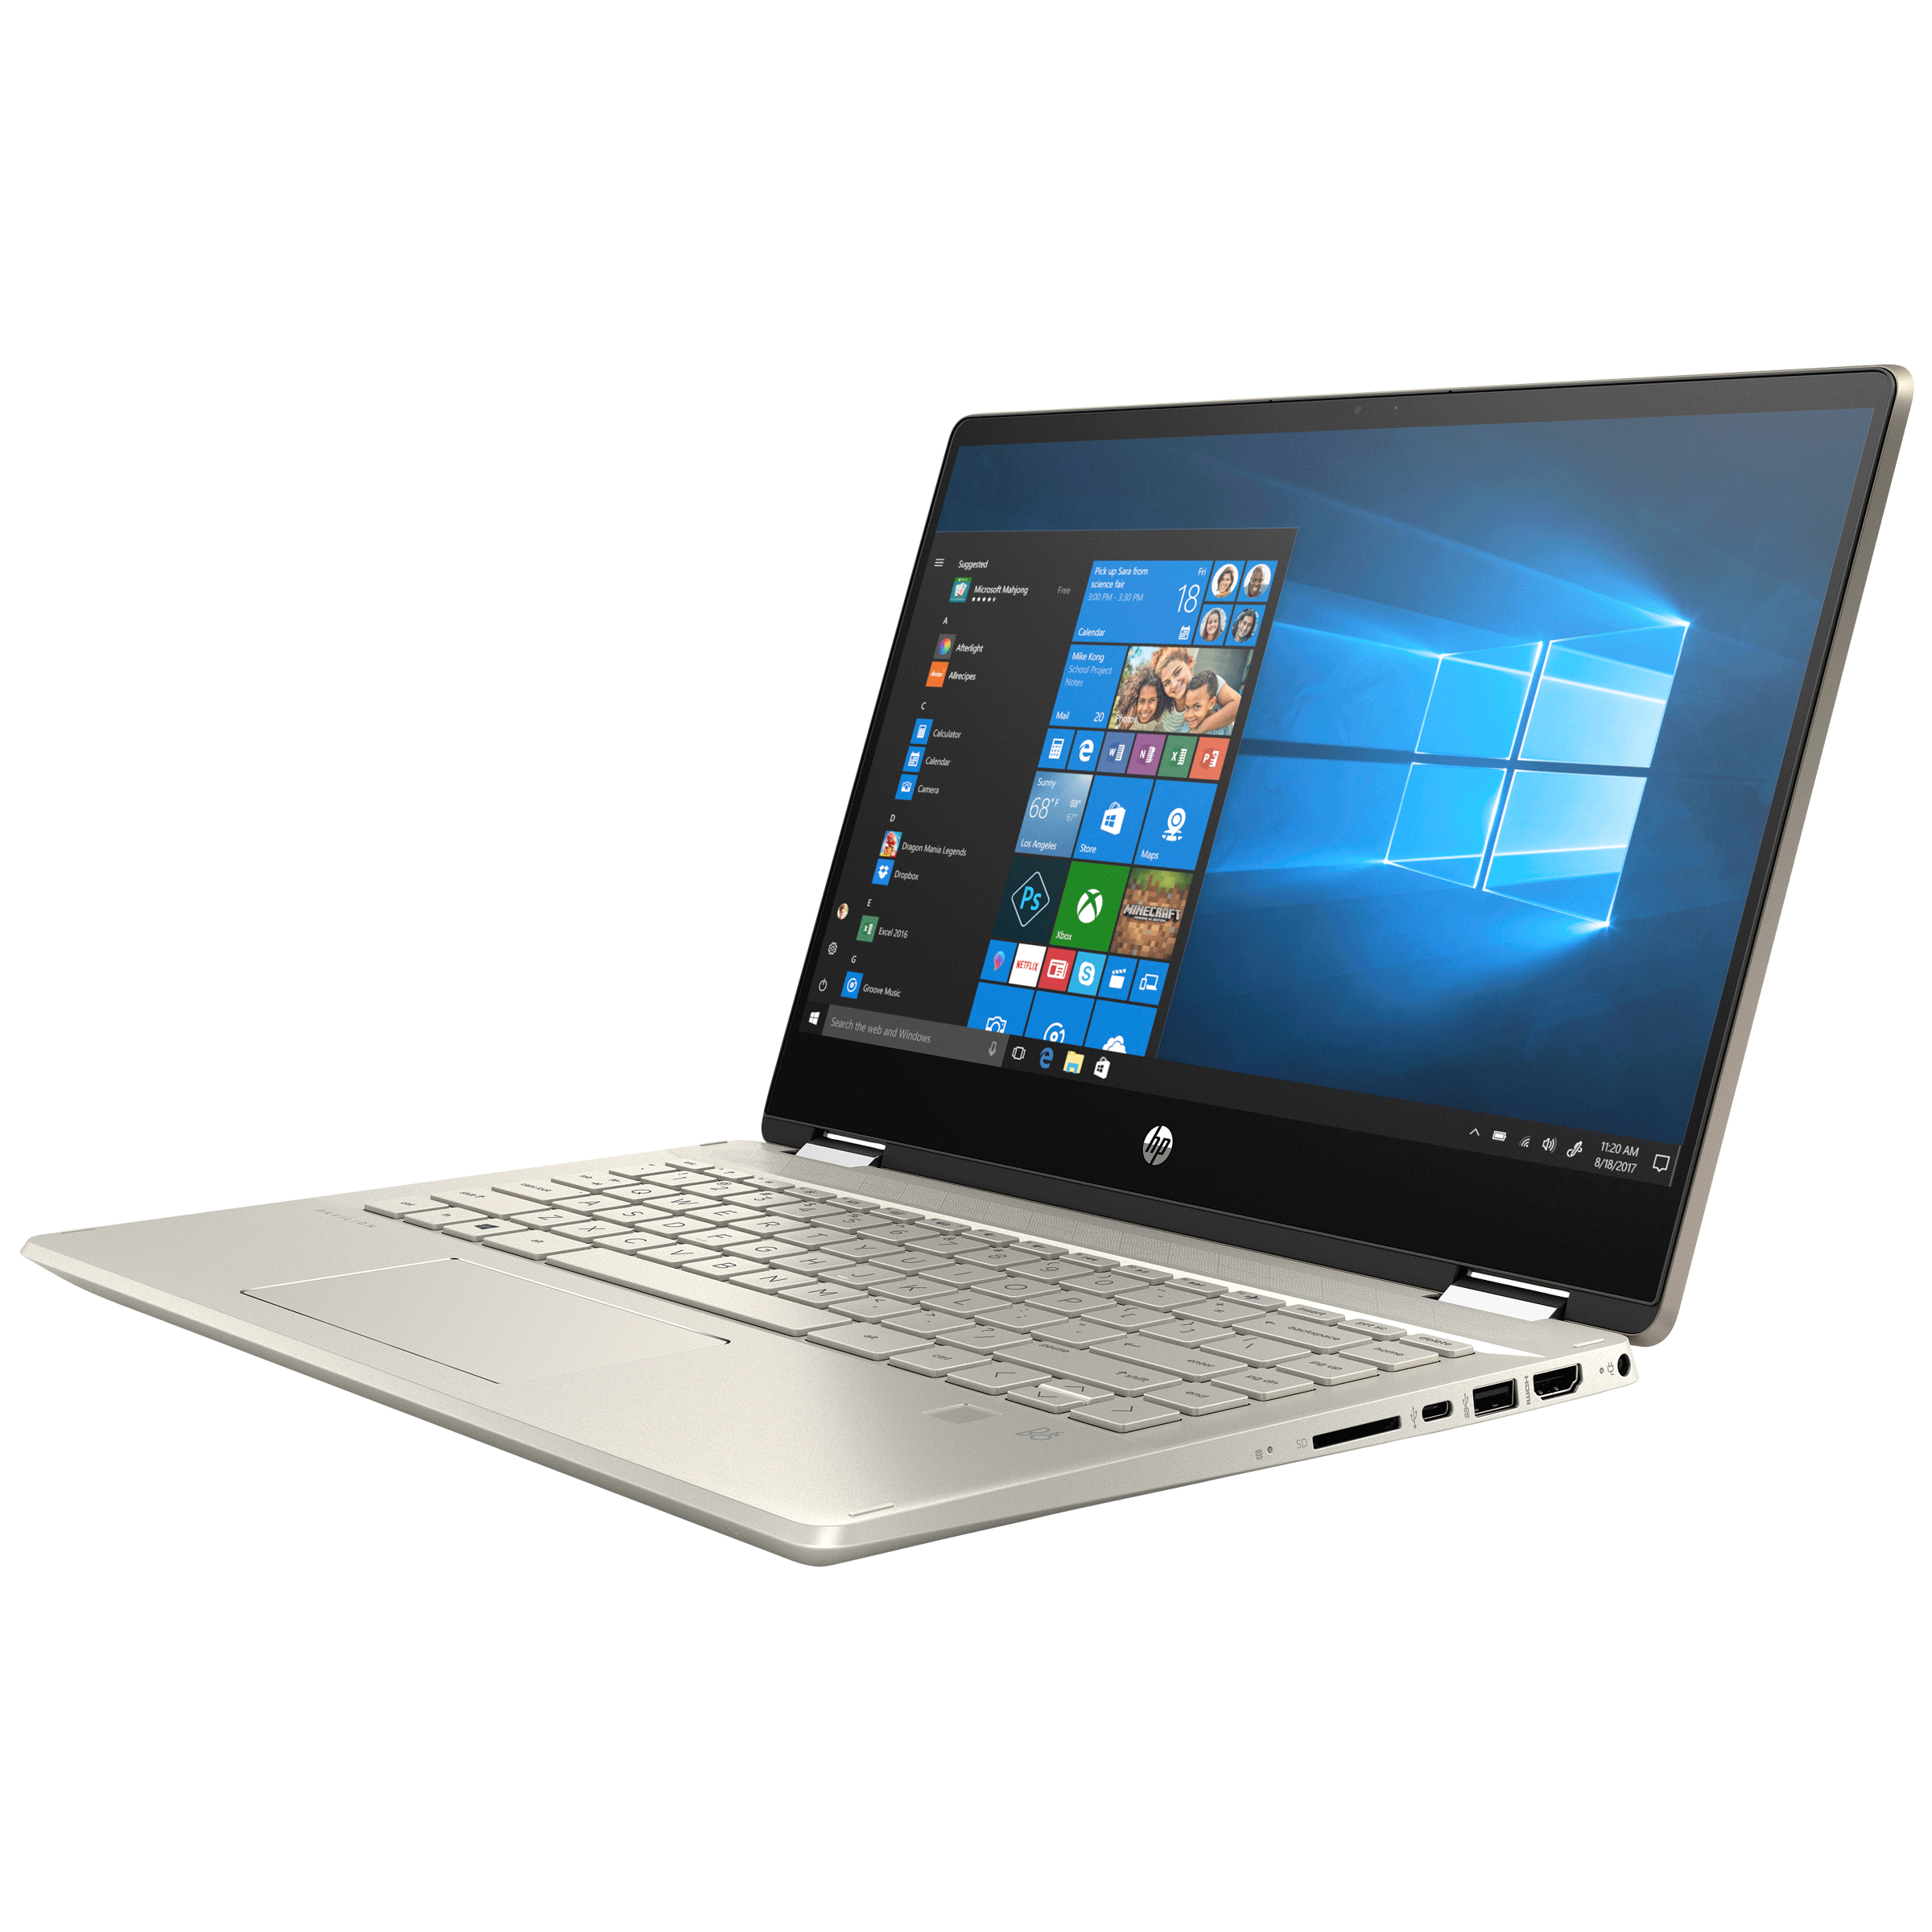 HP Pavilion x360 Convertible 14-dh1502TU (401S0PA#ACJ) Core i3 10th Gen Windows 10 Home 2-in-1 Laptop (8GB RAM, 512GB SSD, Intel UHD Graphics, MS Office, 35.56cm, Warm Gold)_3